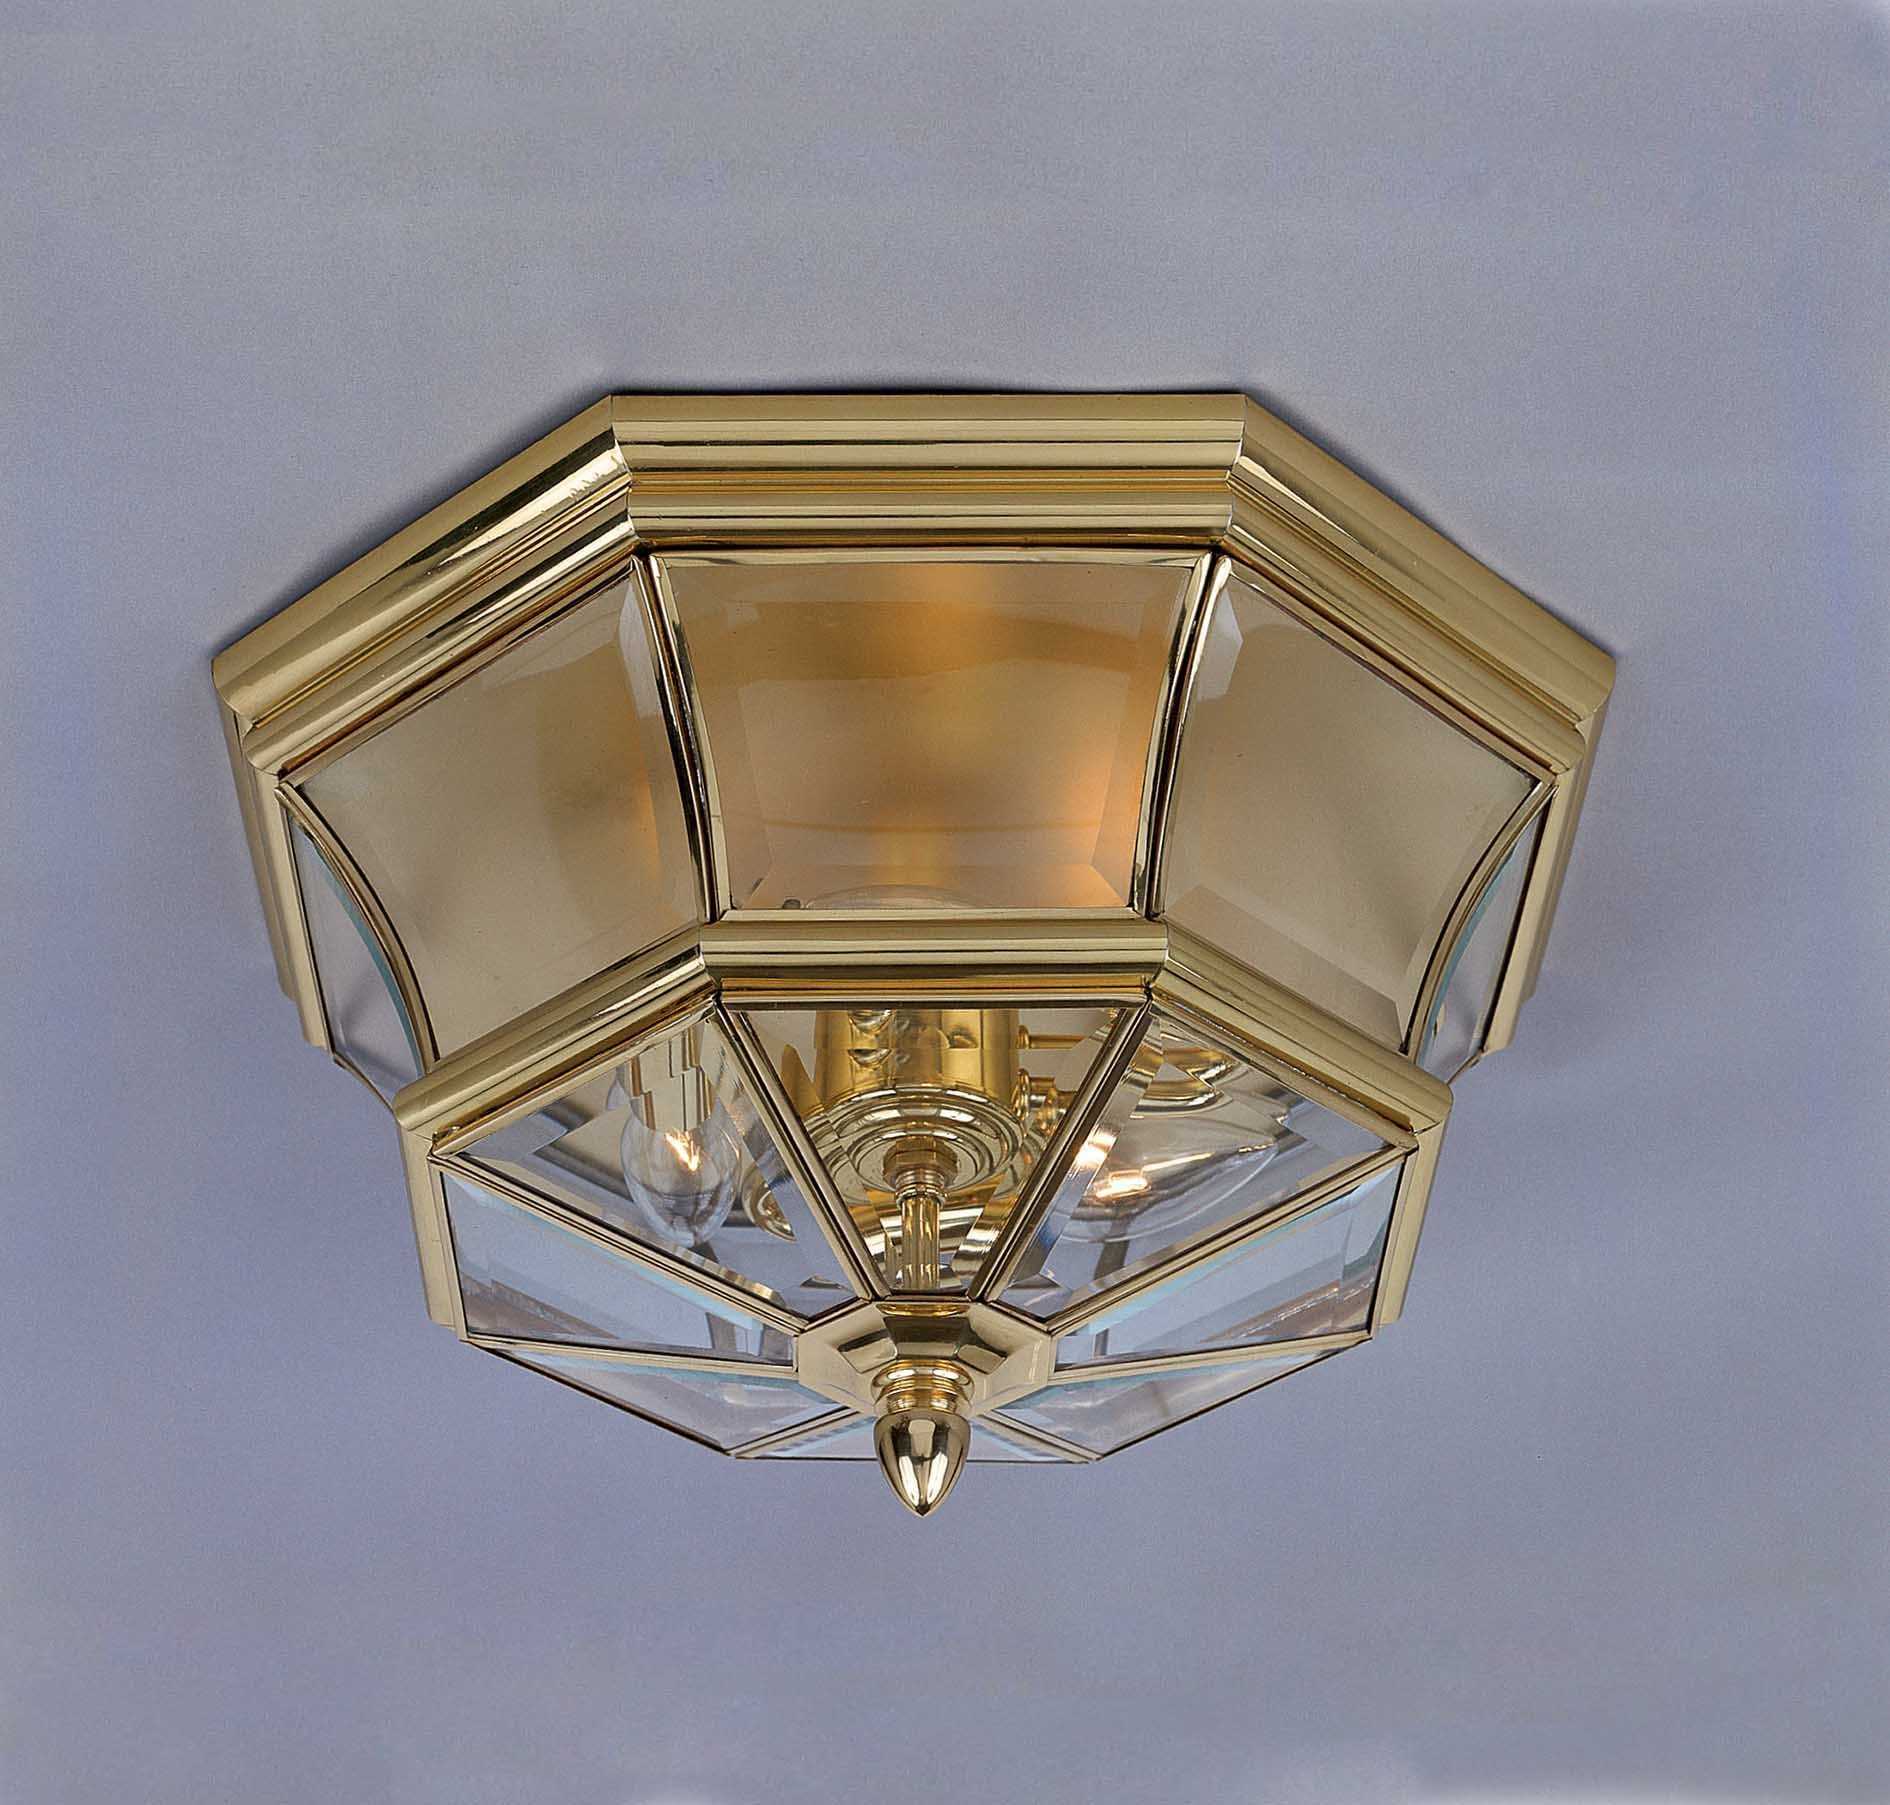 Quoizel NY1794B 3-Light Newbury Outdoor Lantern in Polished Brass